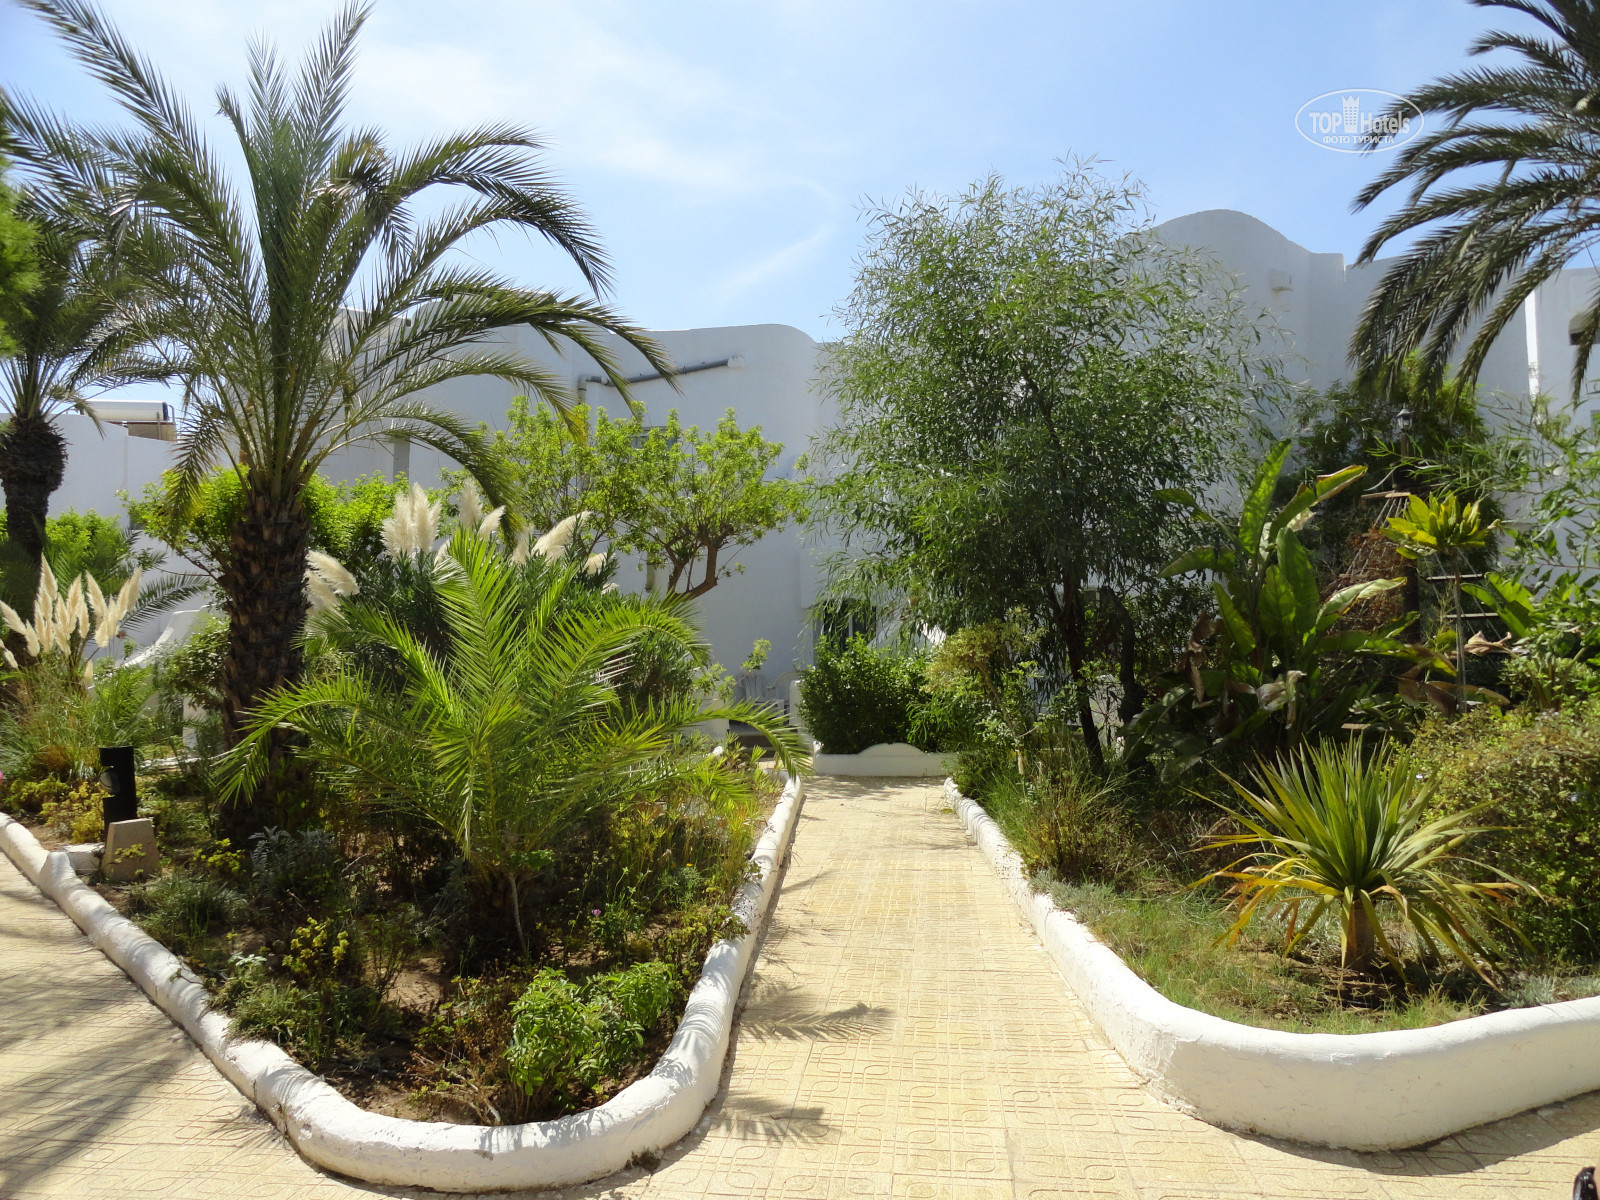 All photos: Hotel territory отеля Fiesta Beach 4*. Rating of world ...